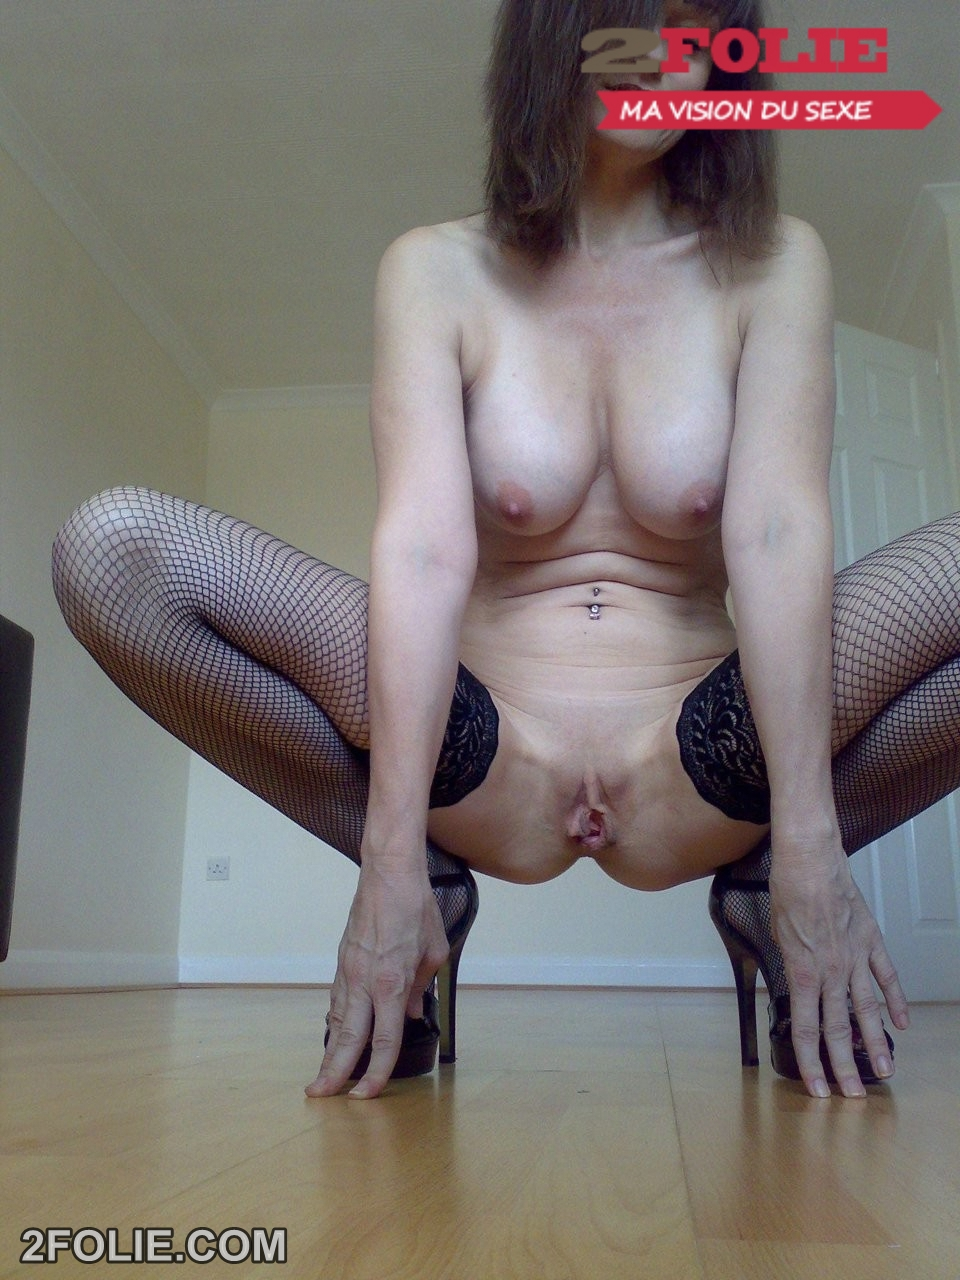 hot anal sex clips sex femmes en pull et gilet films porno